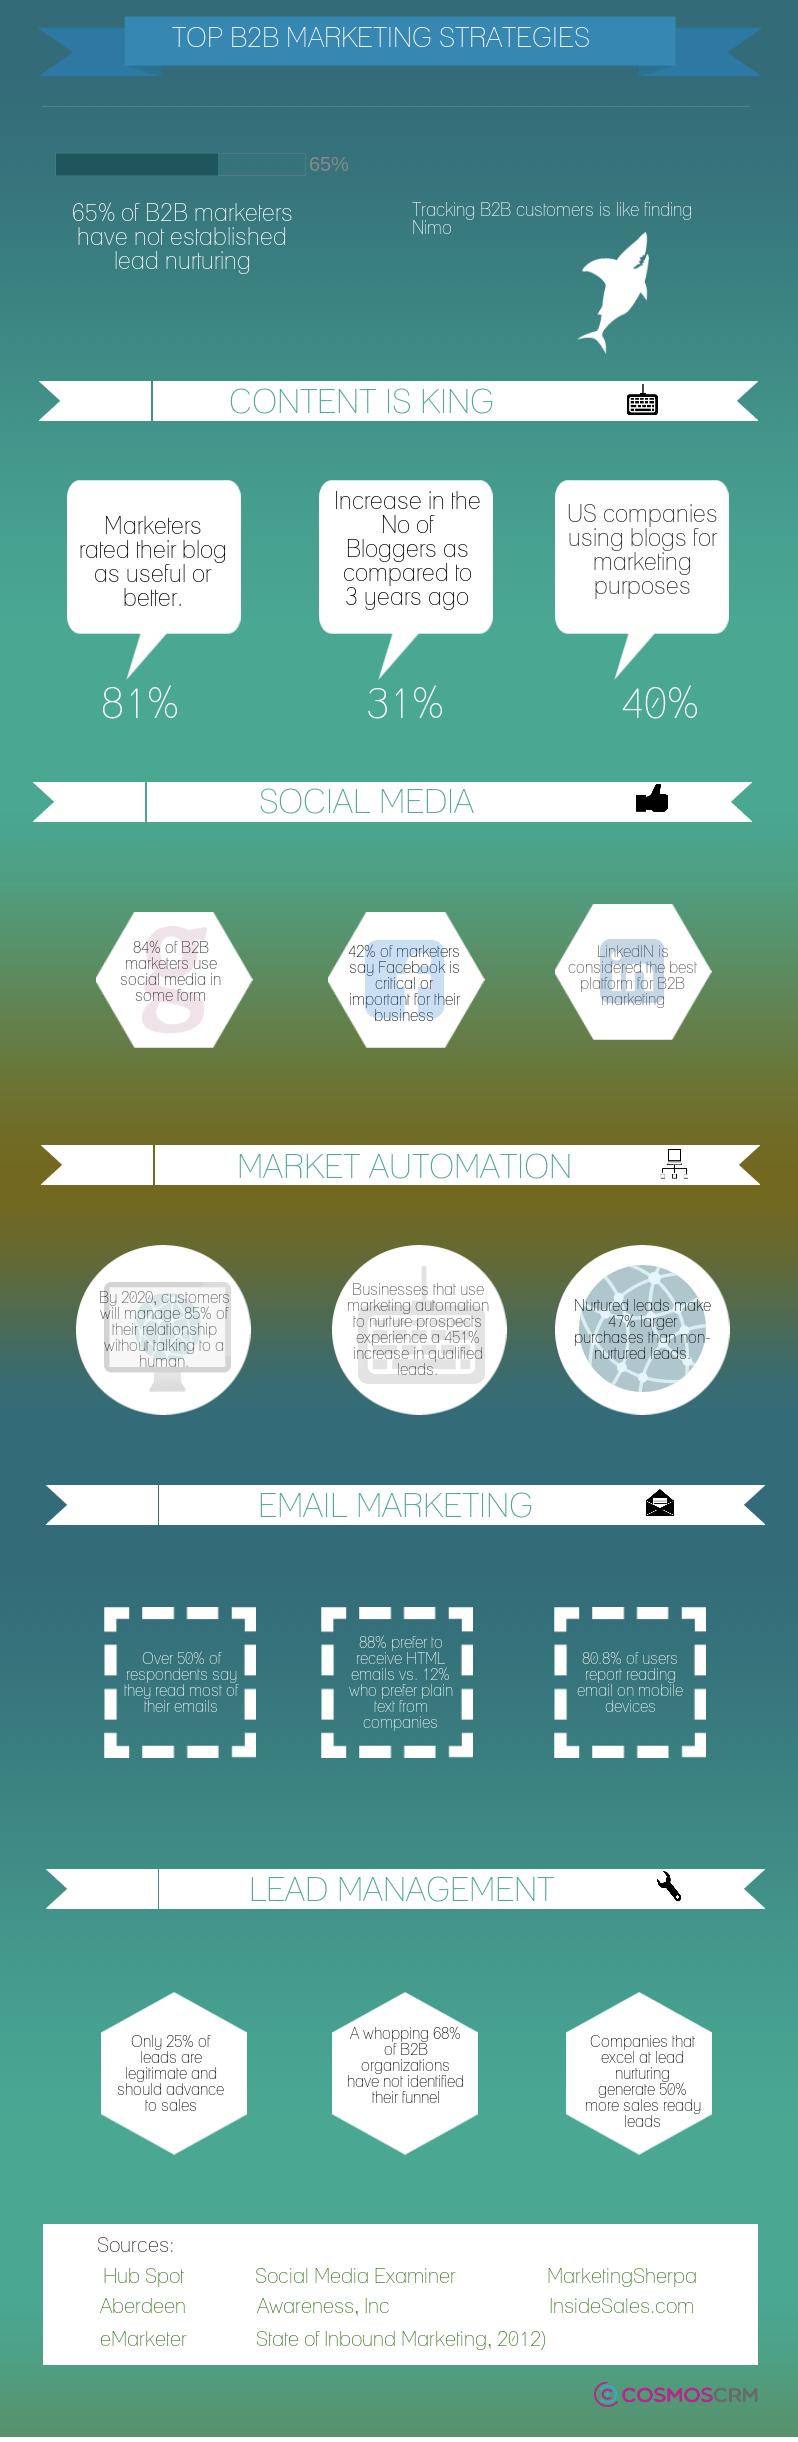 Top B2B Marketing Strategies infographic B2B Marketing